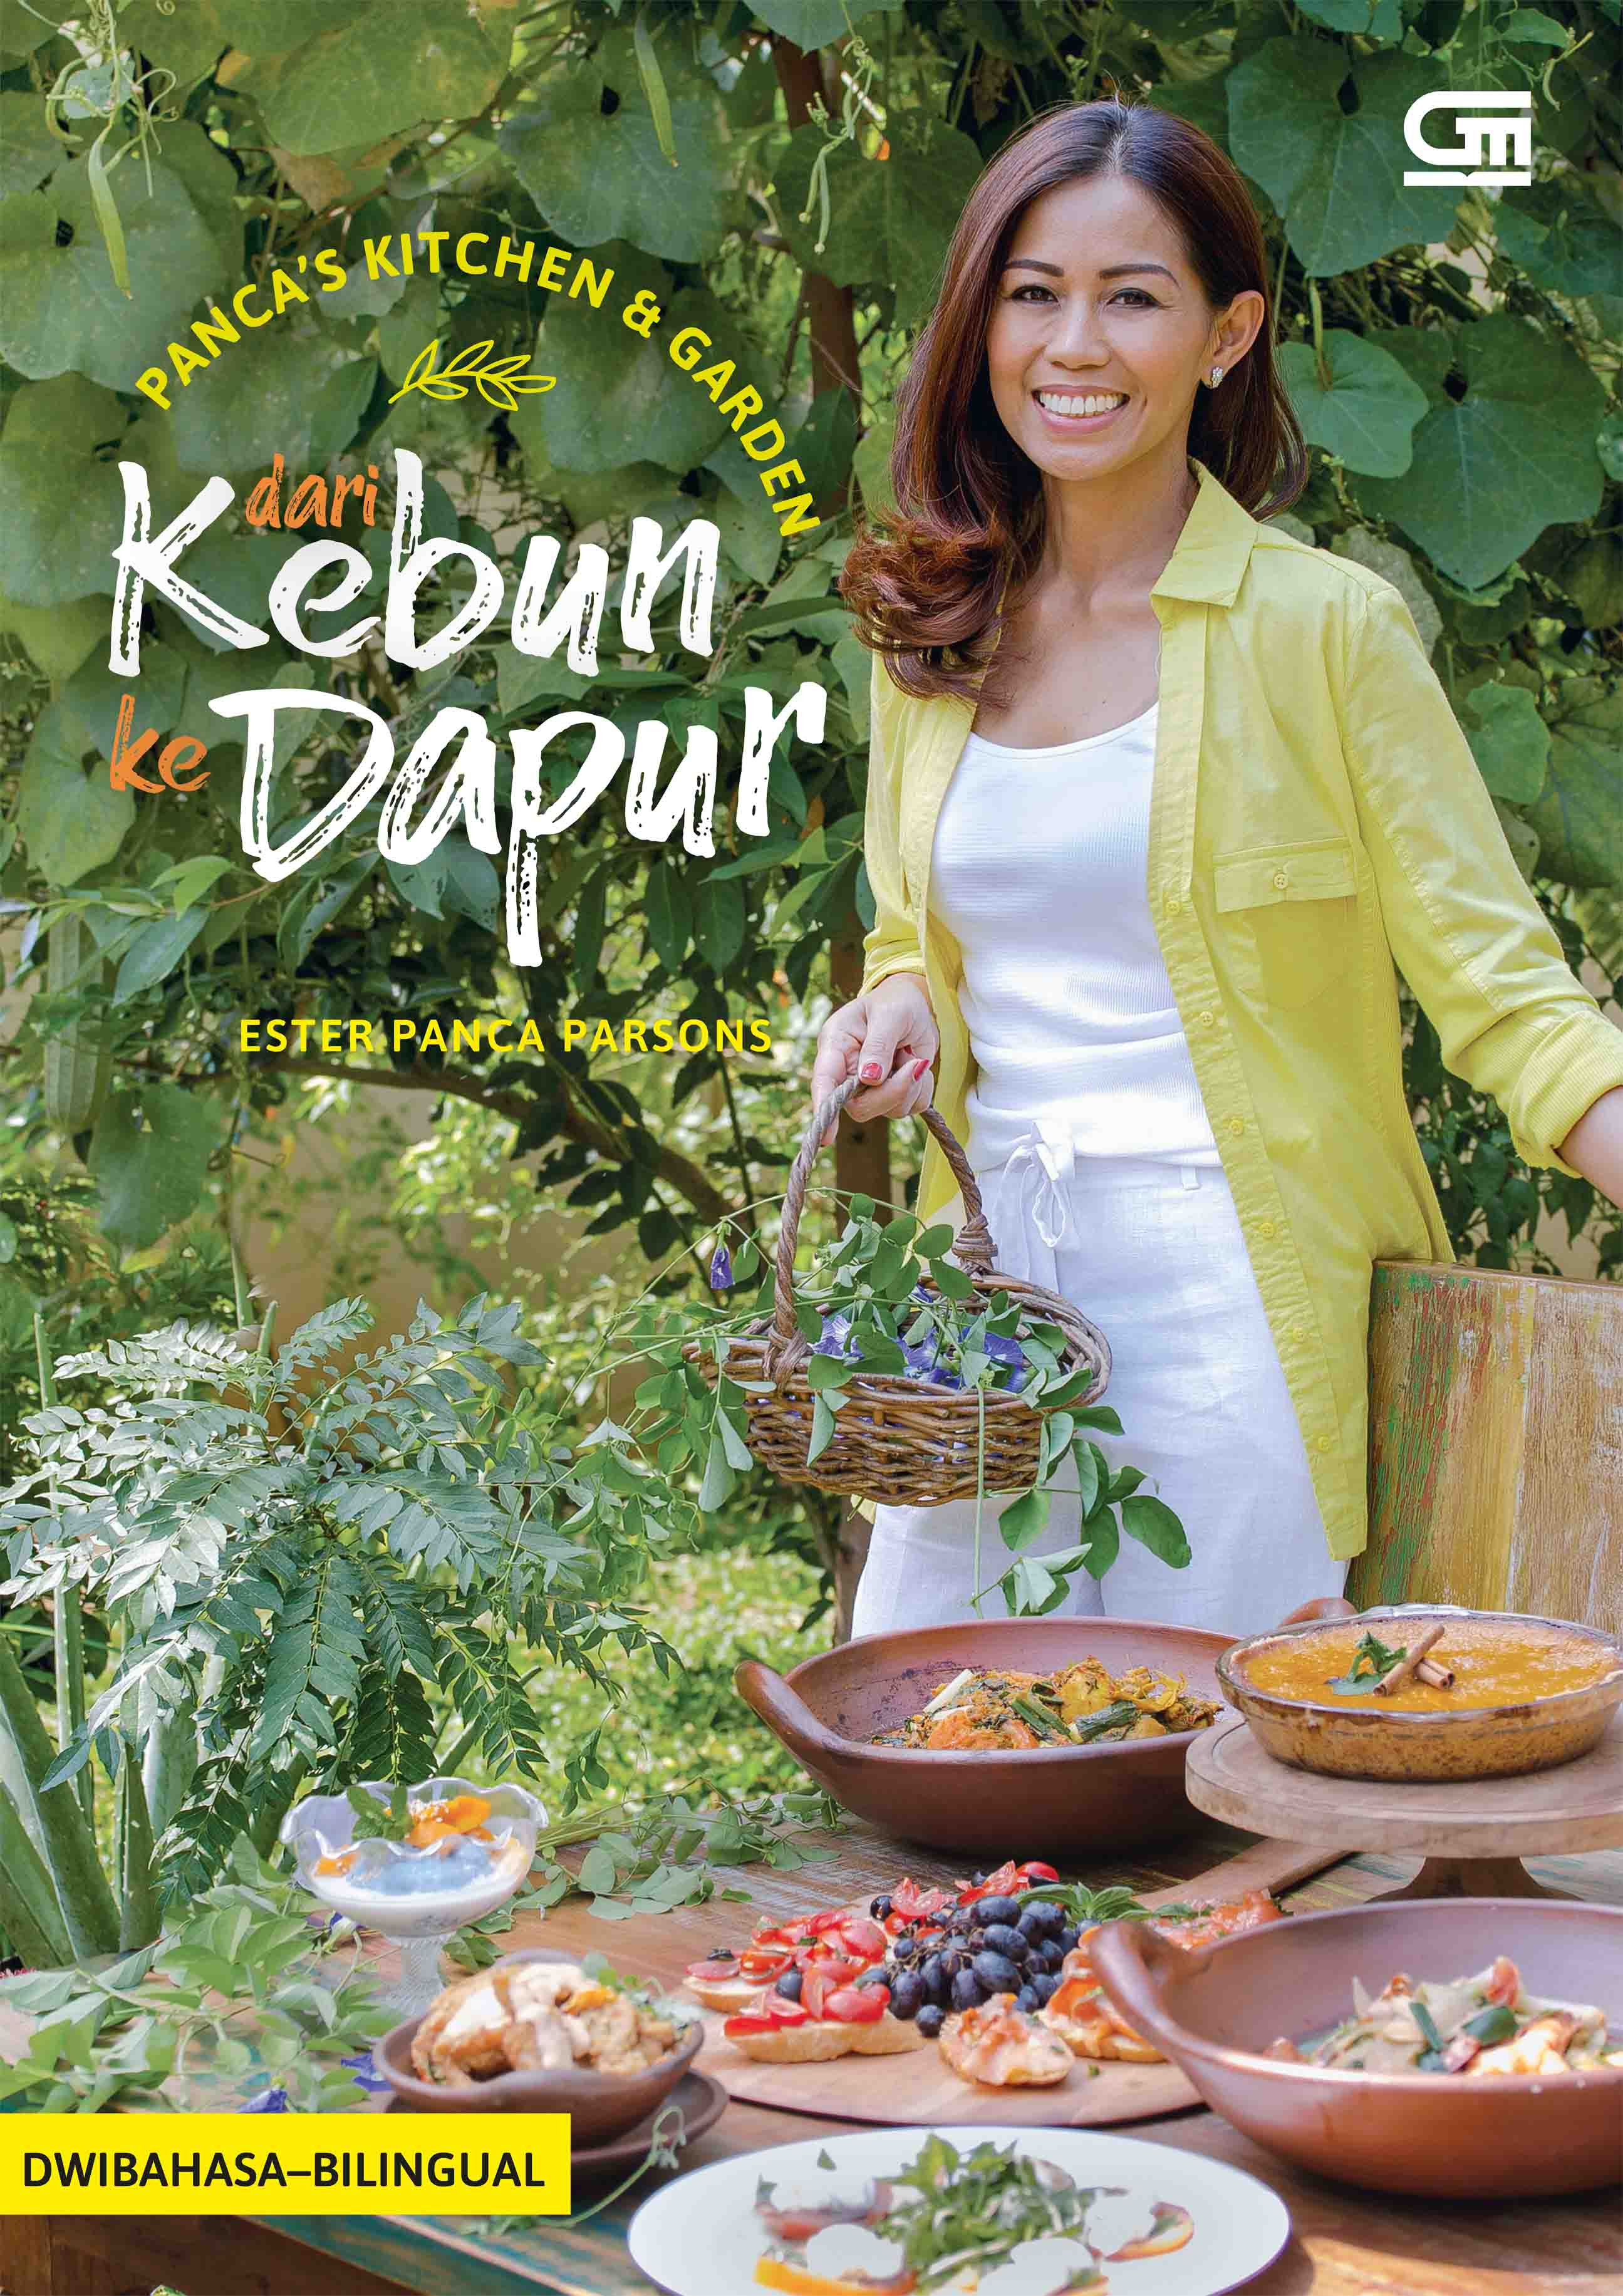 Panca\\\'s Kitchen & Garden dari Kebun ke Dapur